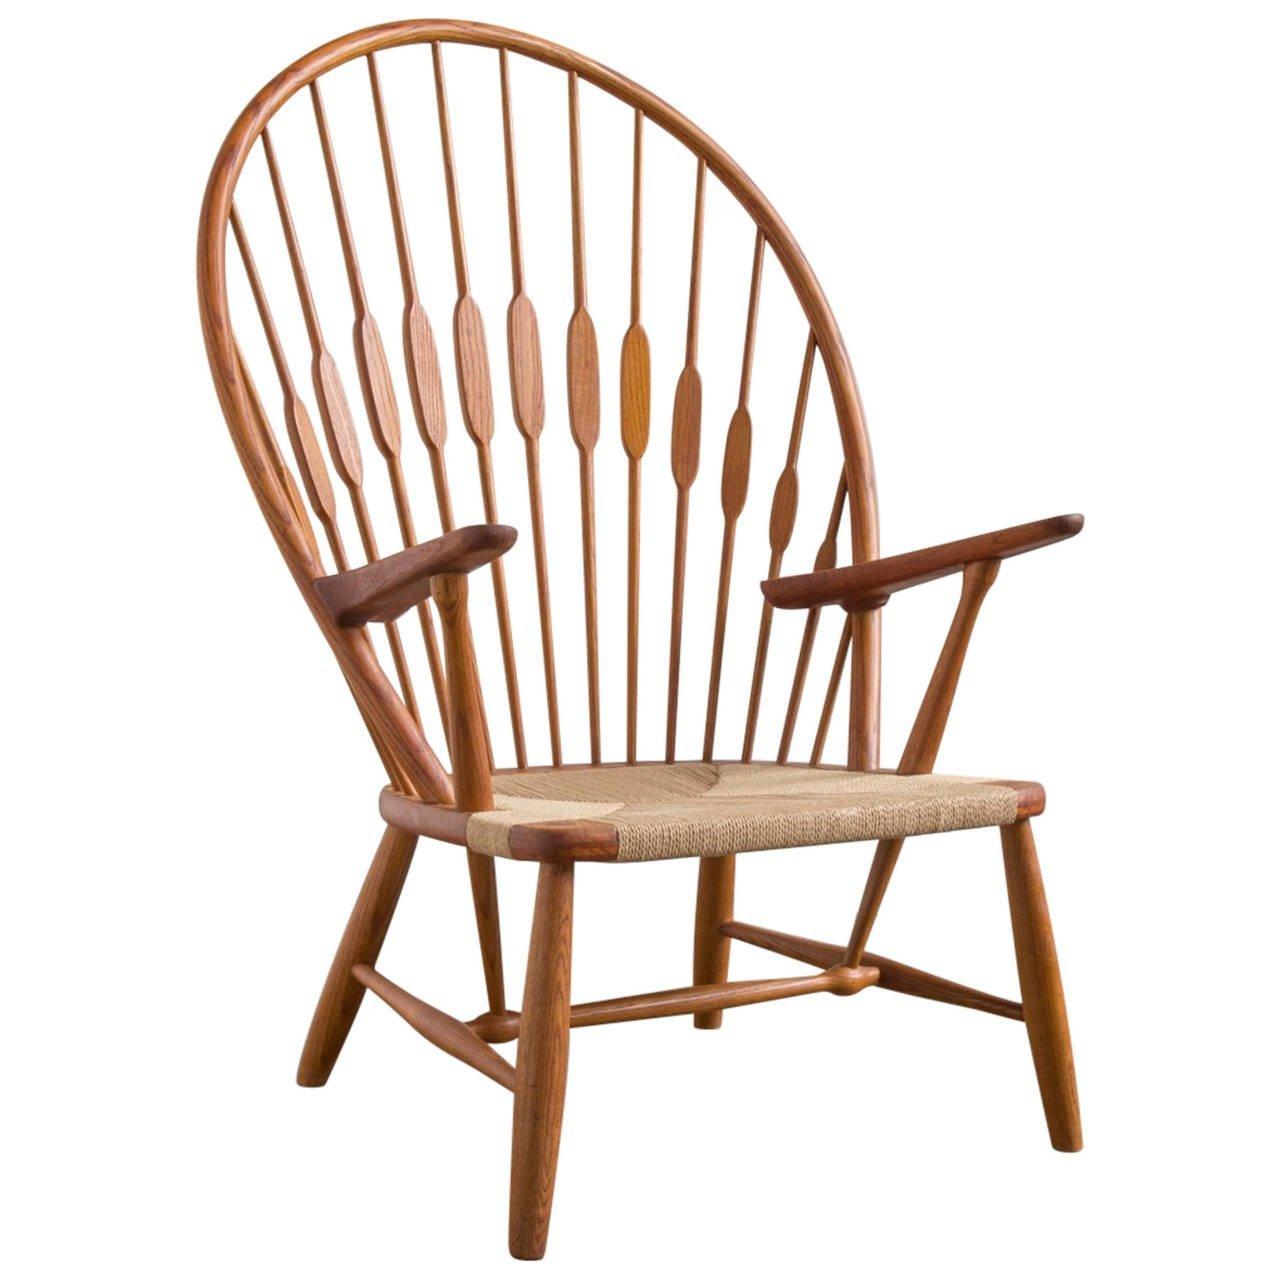 hans wegner peacock chair. Coming Soon Hans Wegner Peacock Chair W